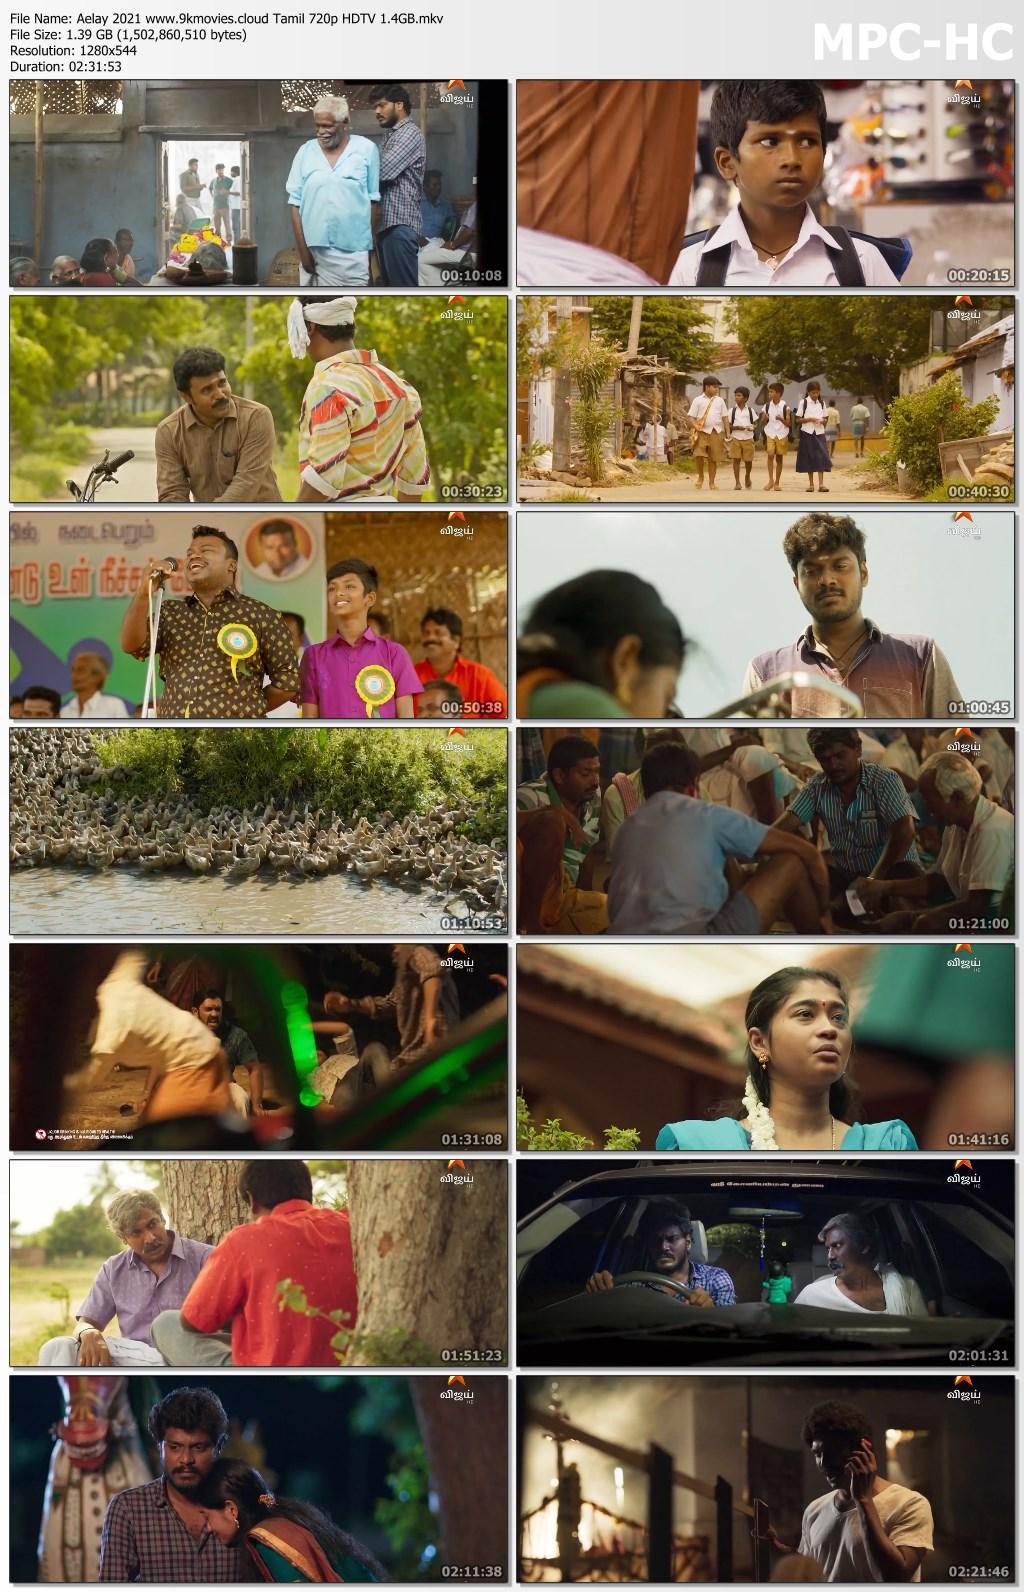 Aelay 2021 Tamil 720p HDTV 1.4GB Download